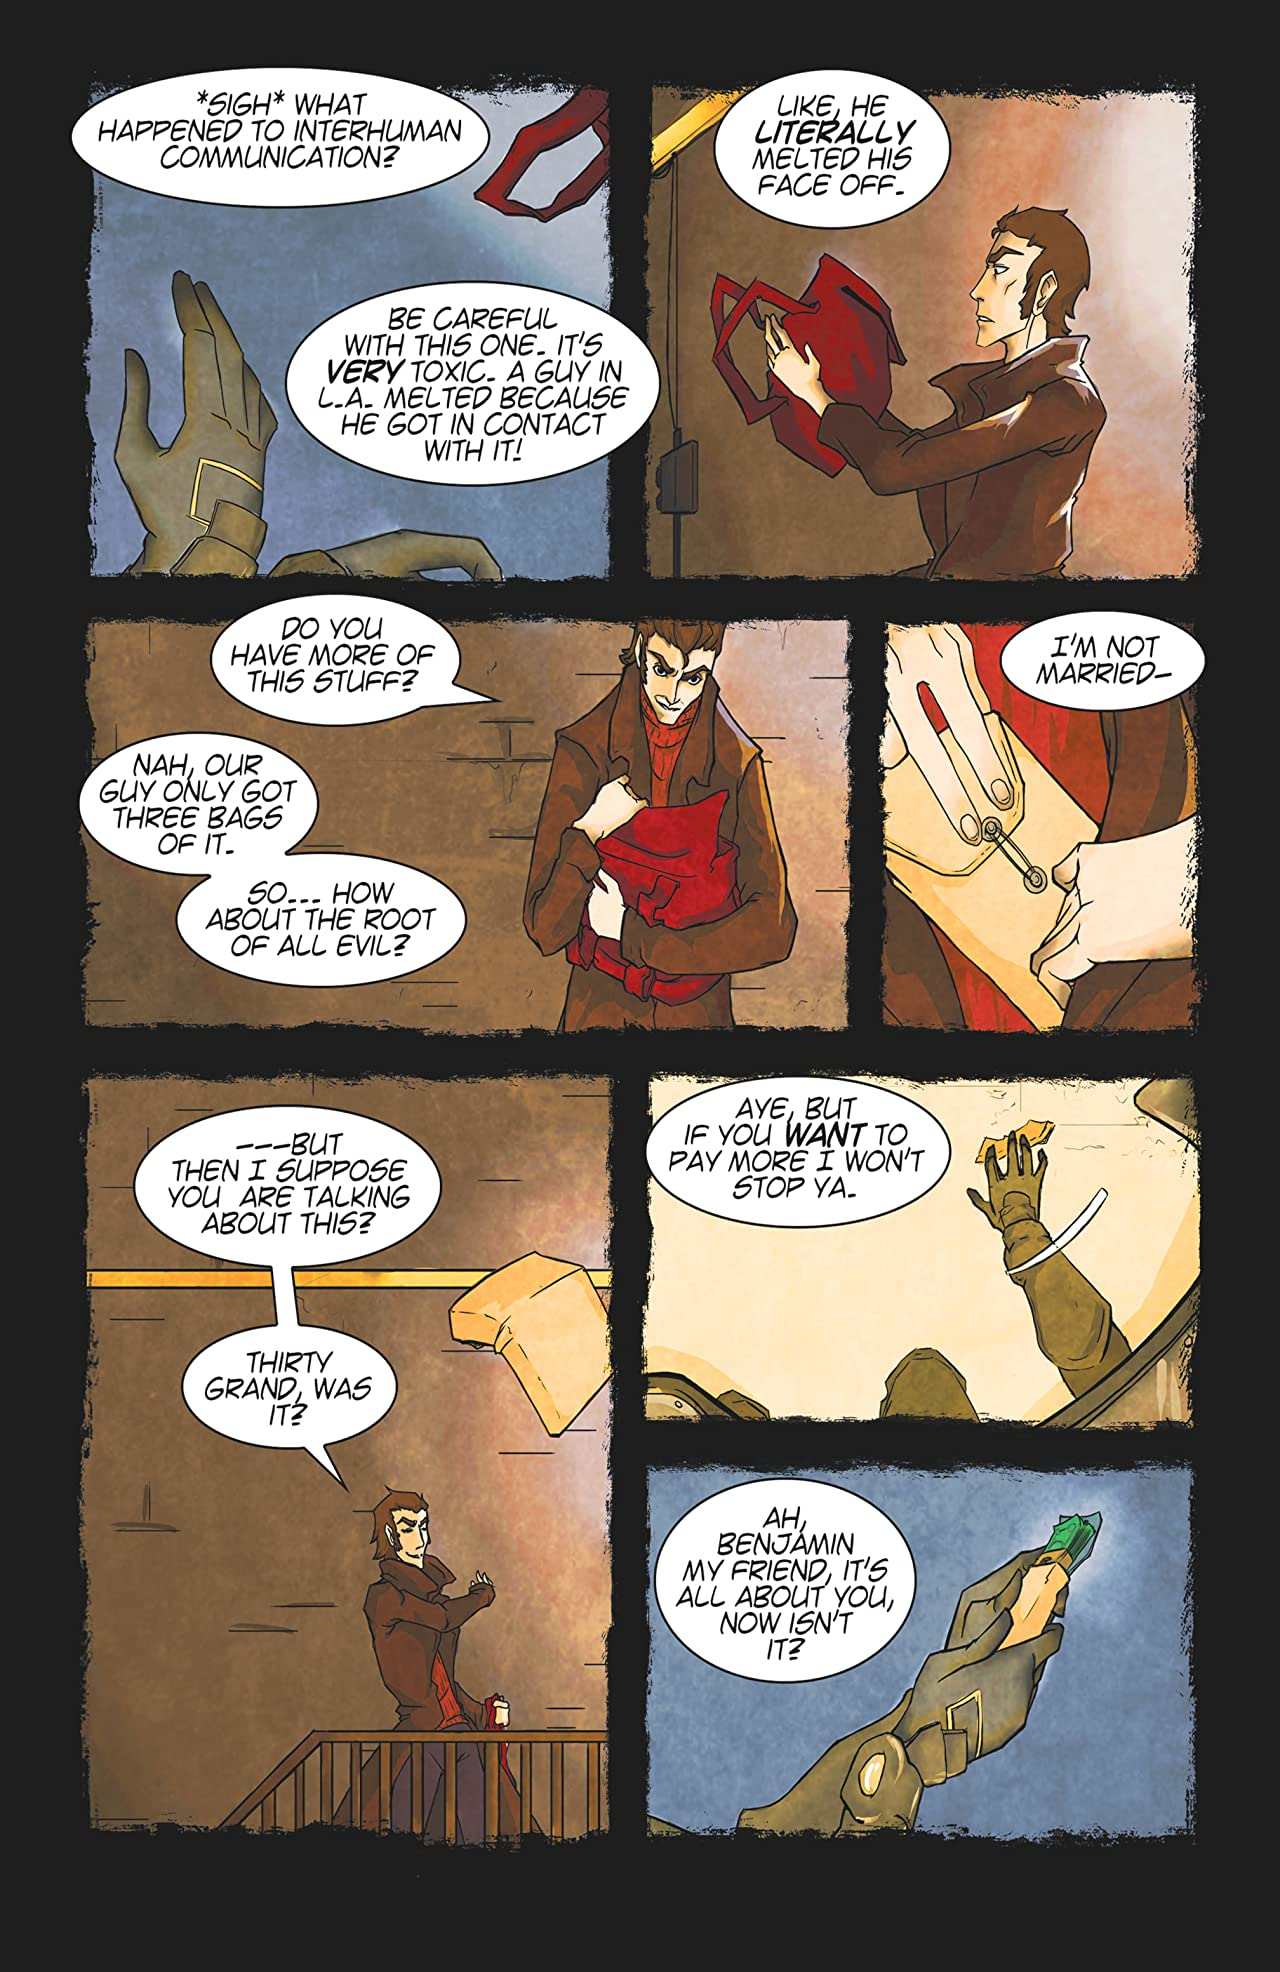 Nightfighter Vol. 2: Exodus